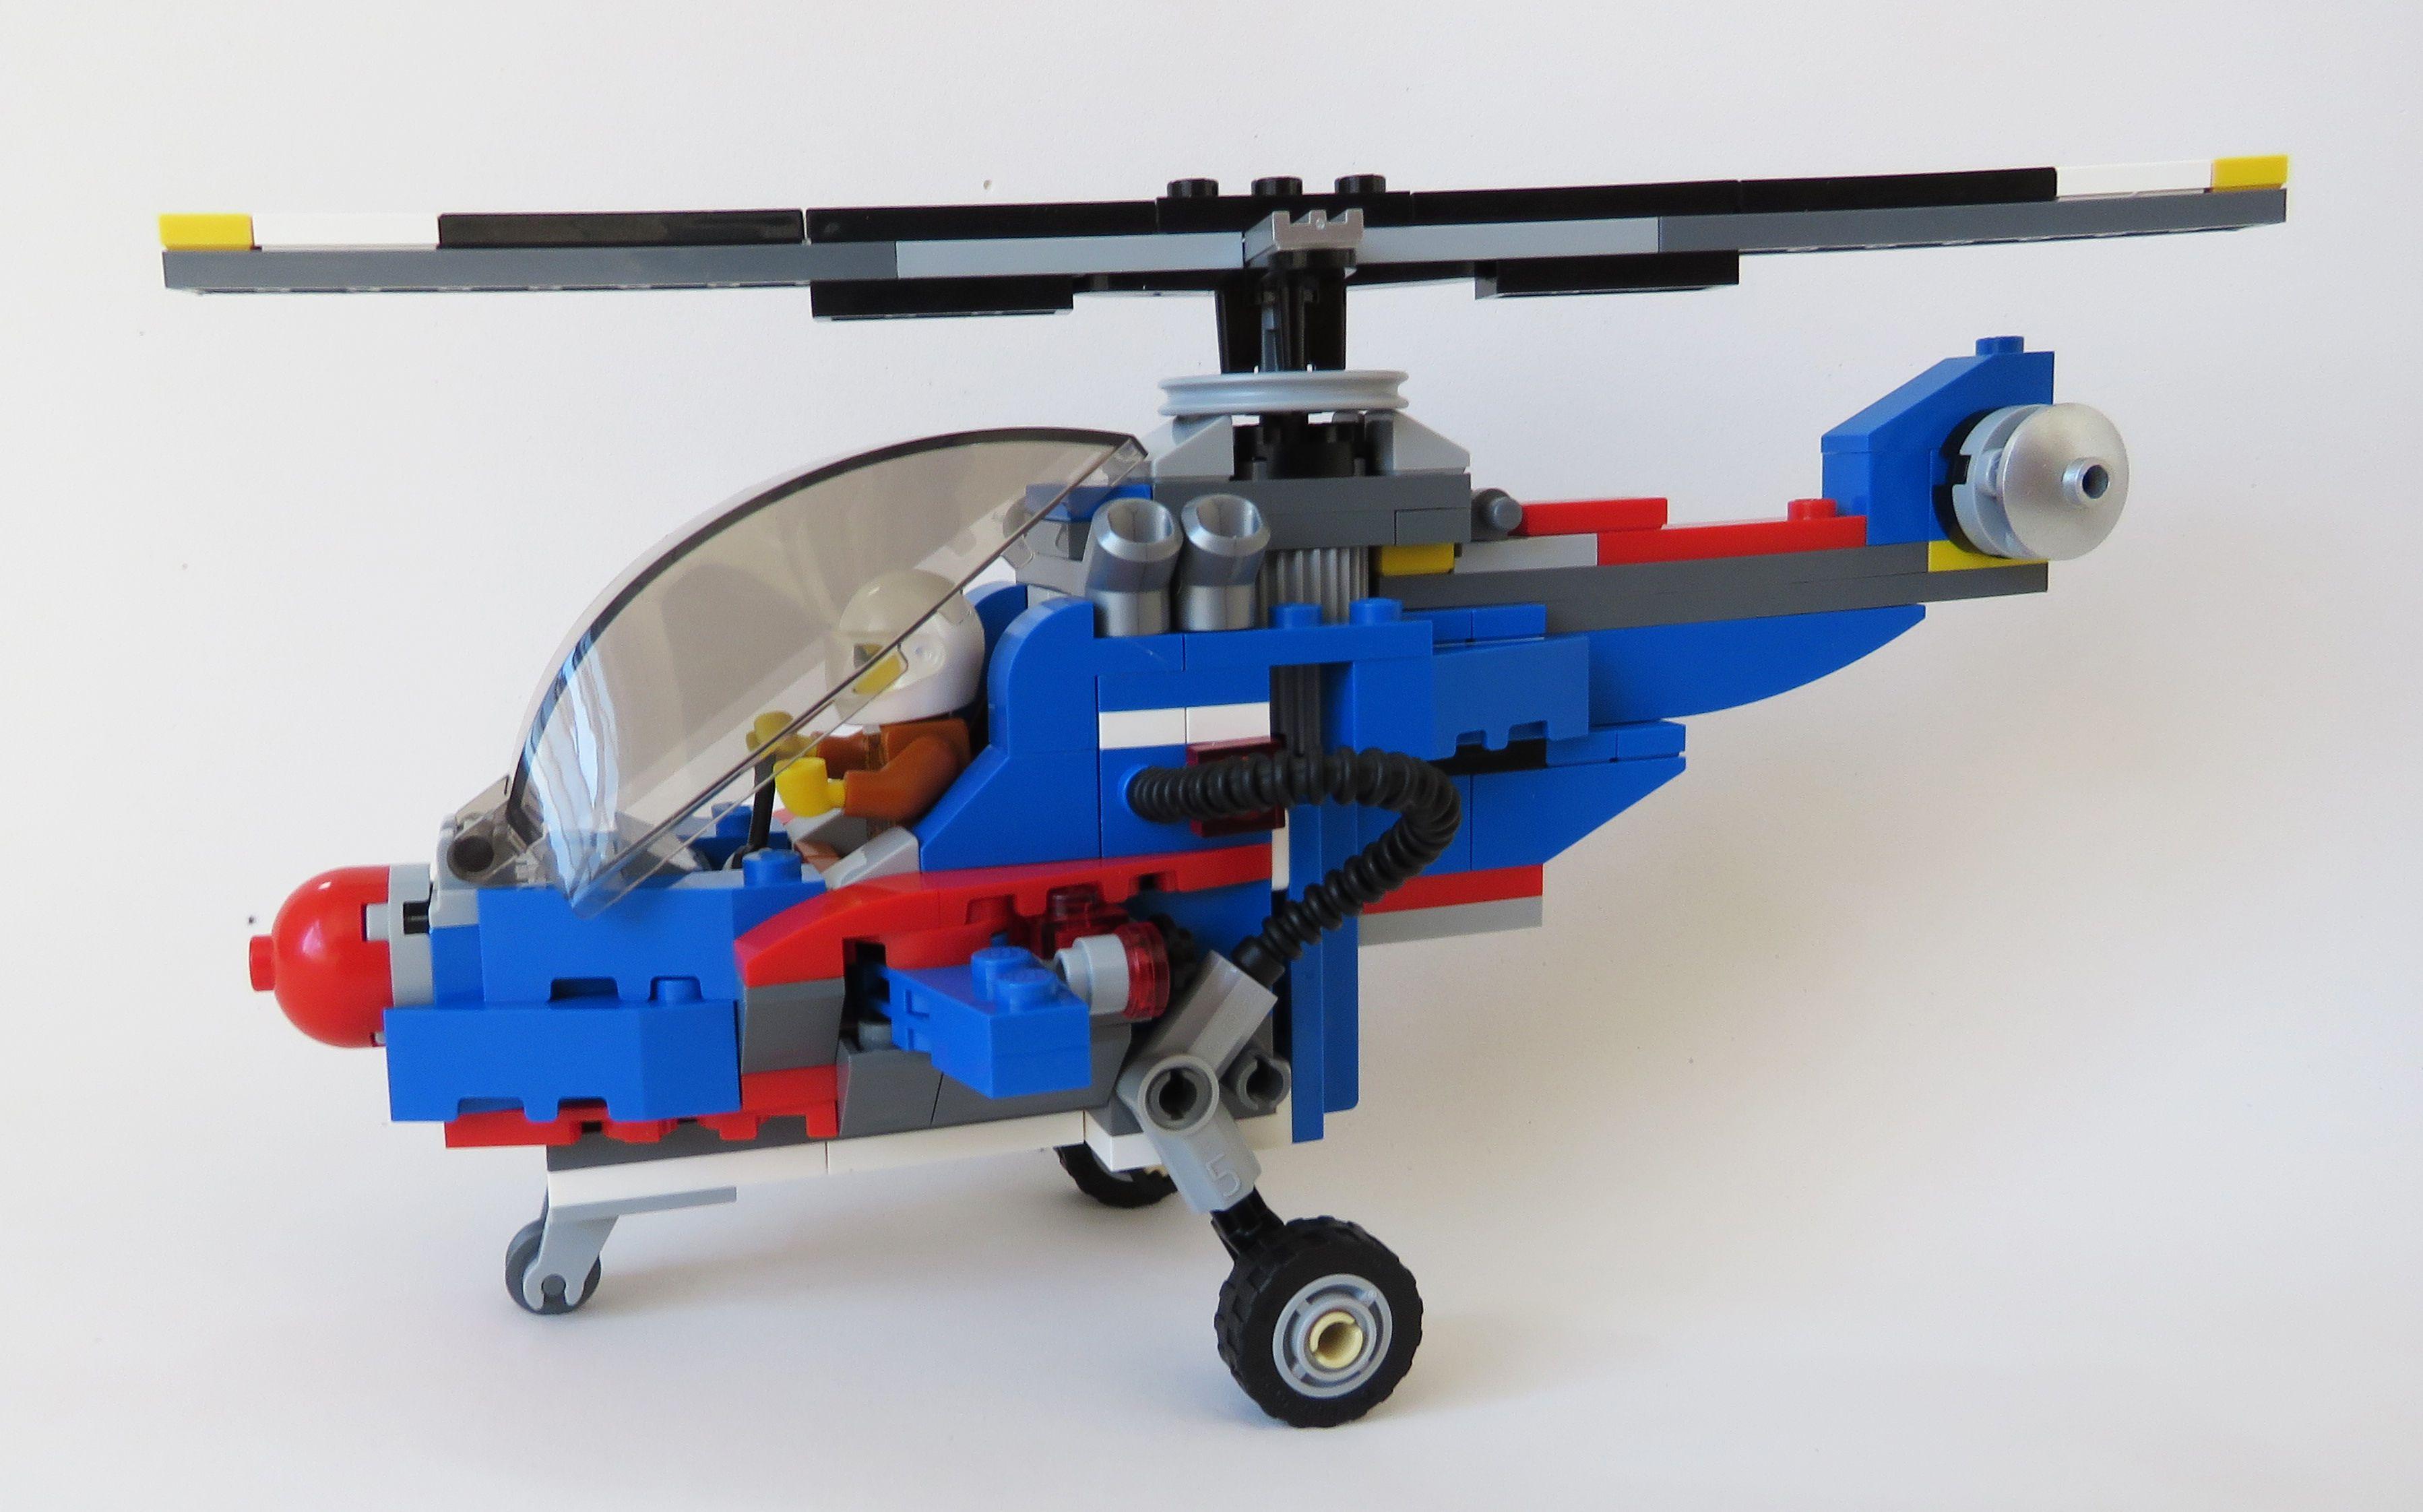 LEGO CREATOR RACE PLANE 31094 (3 in 1 Speed Build